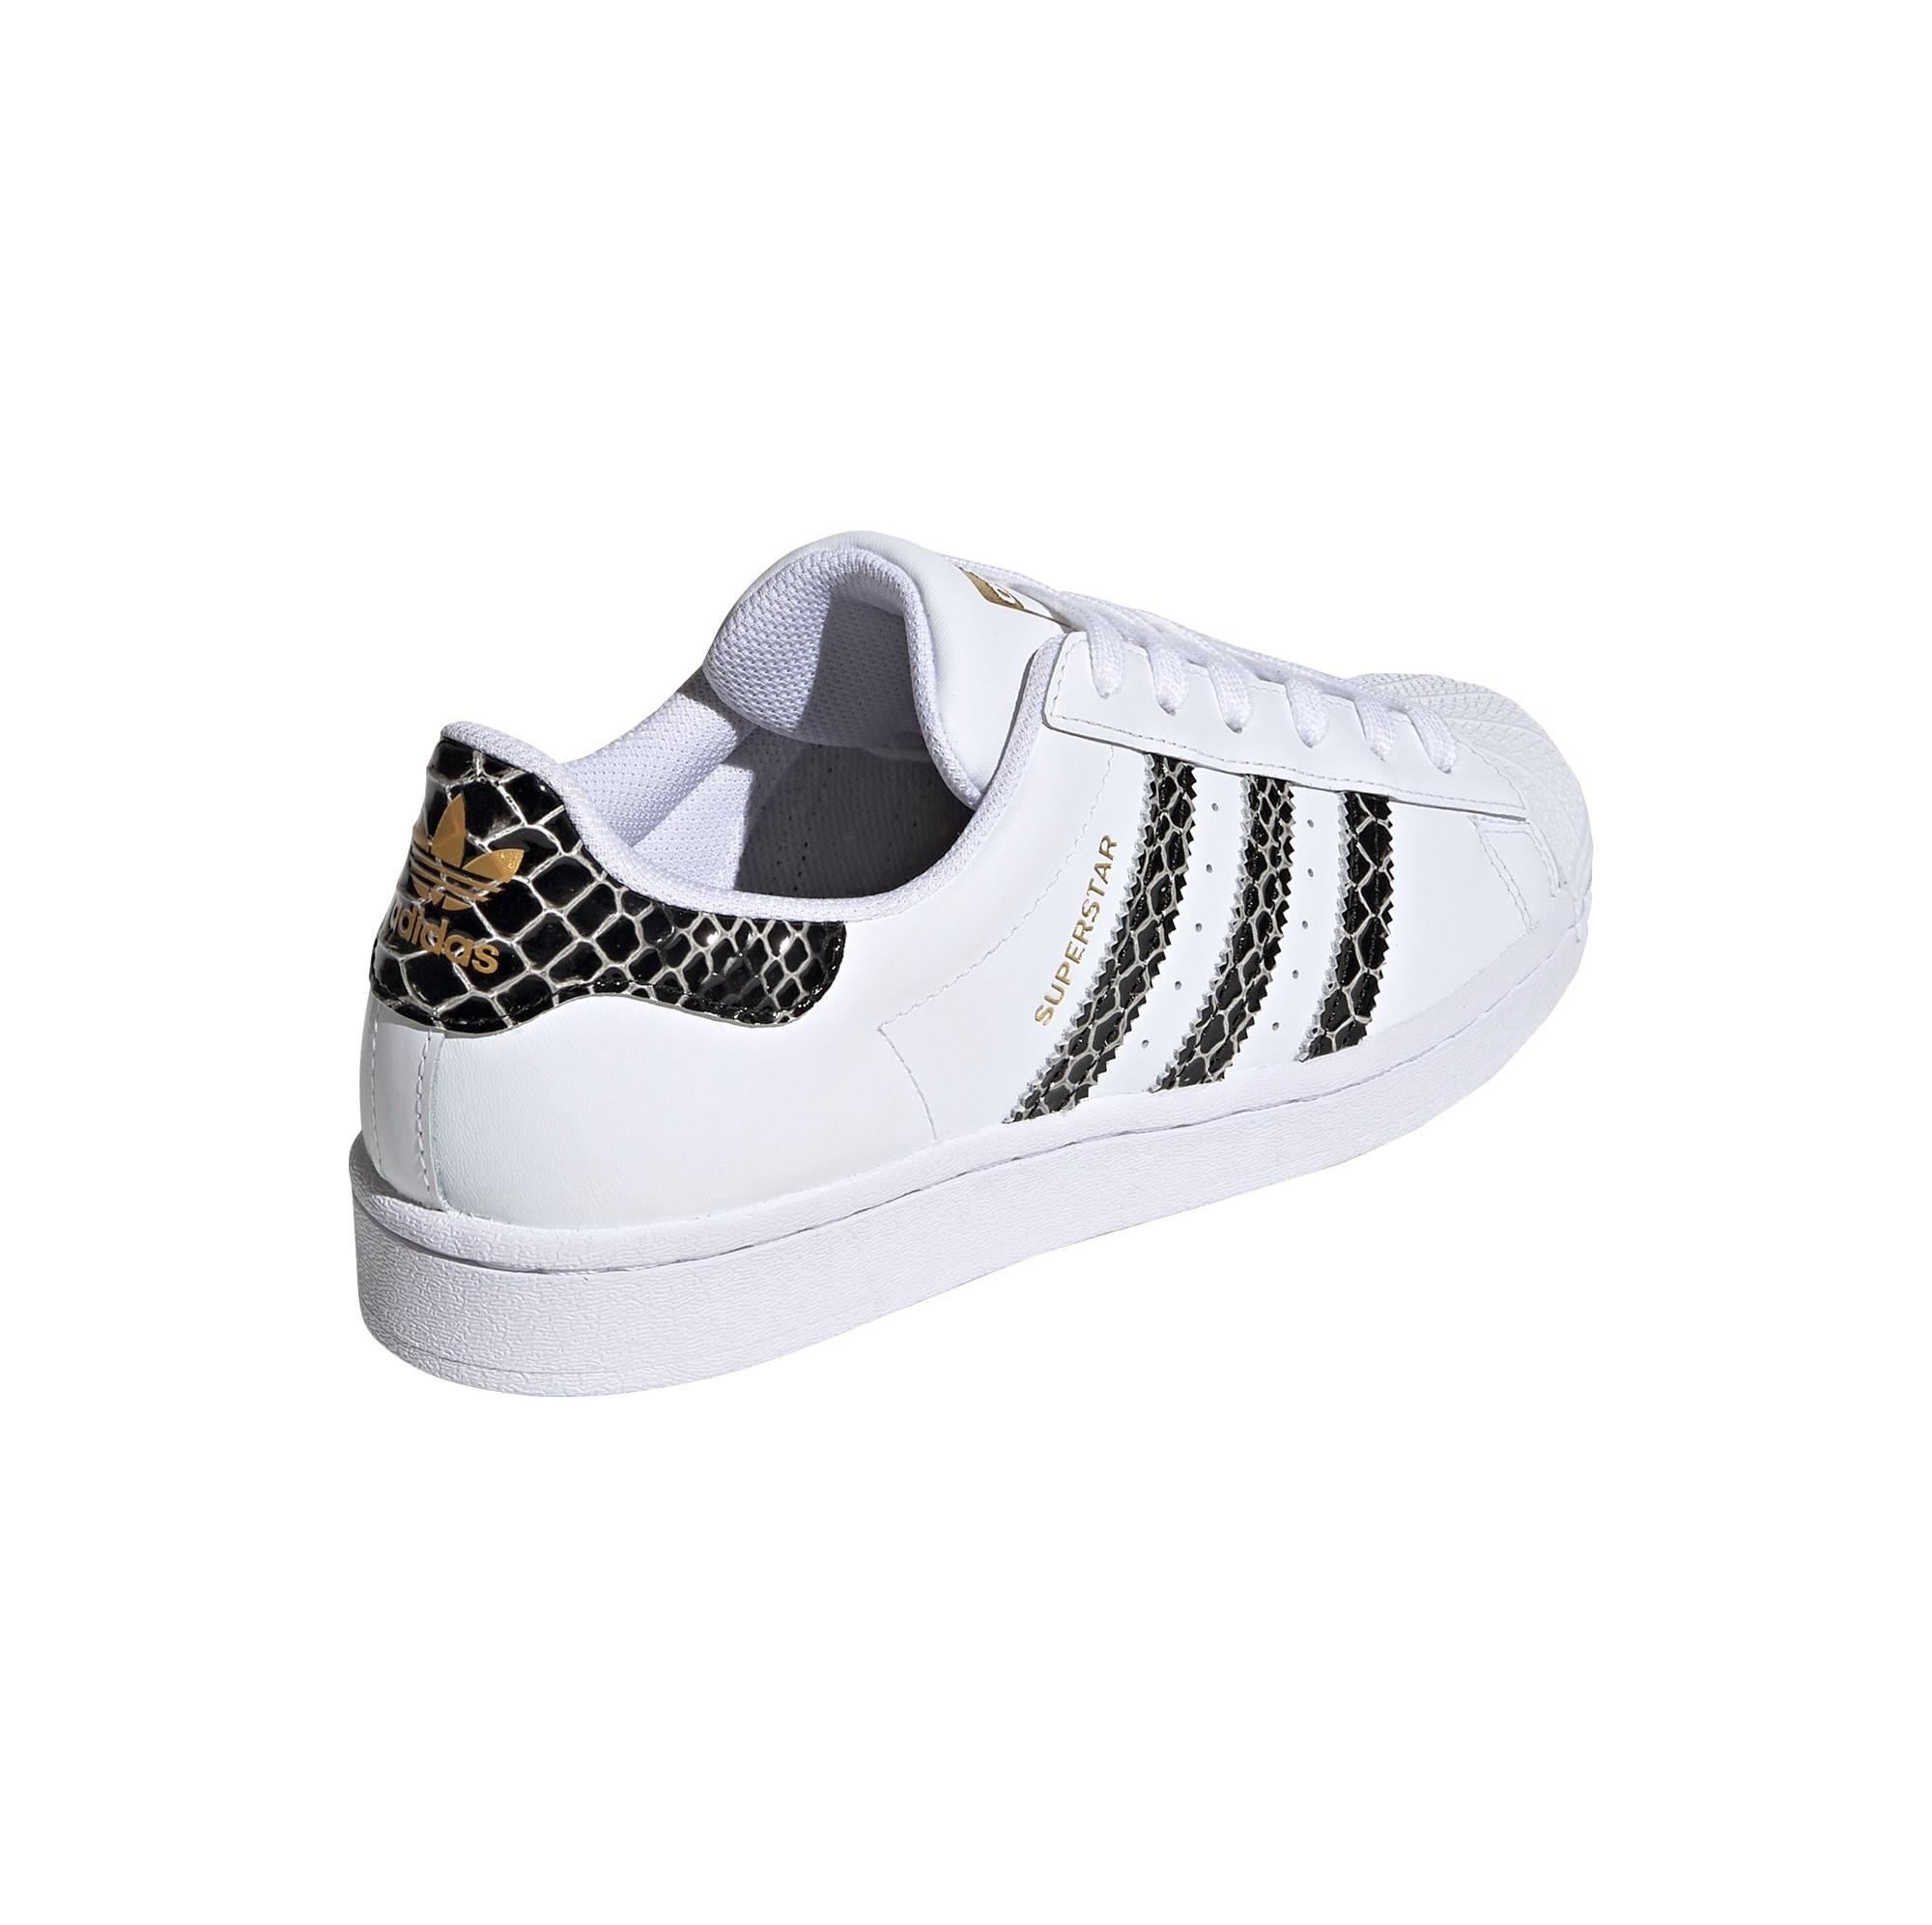 "Sneakers Release – adidas Superstar ""WhiteBlack Python"